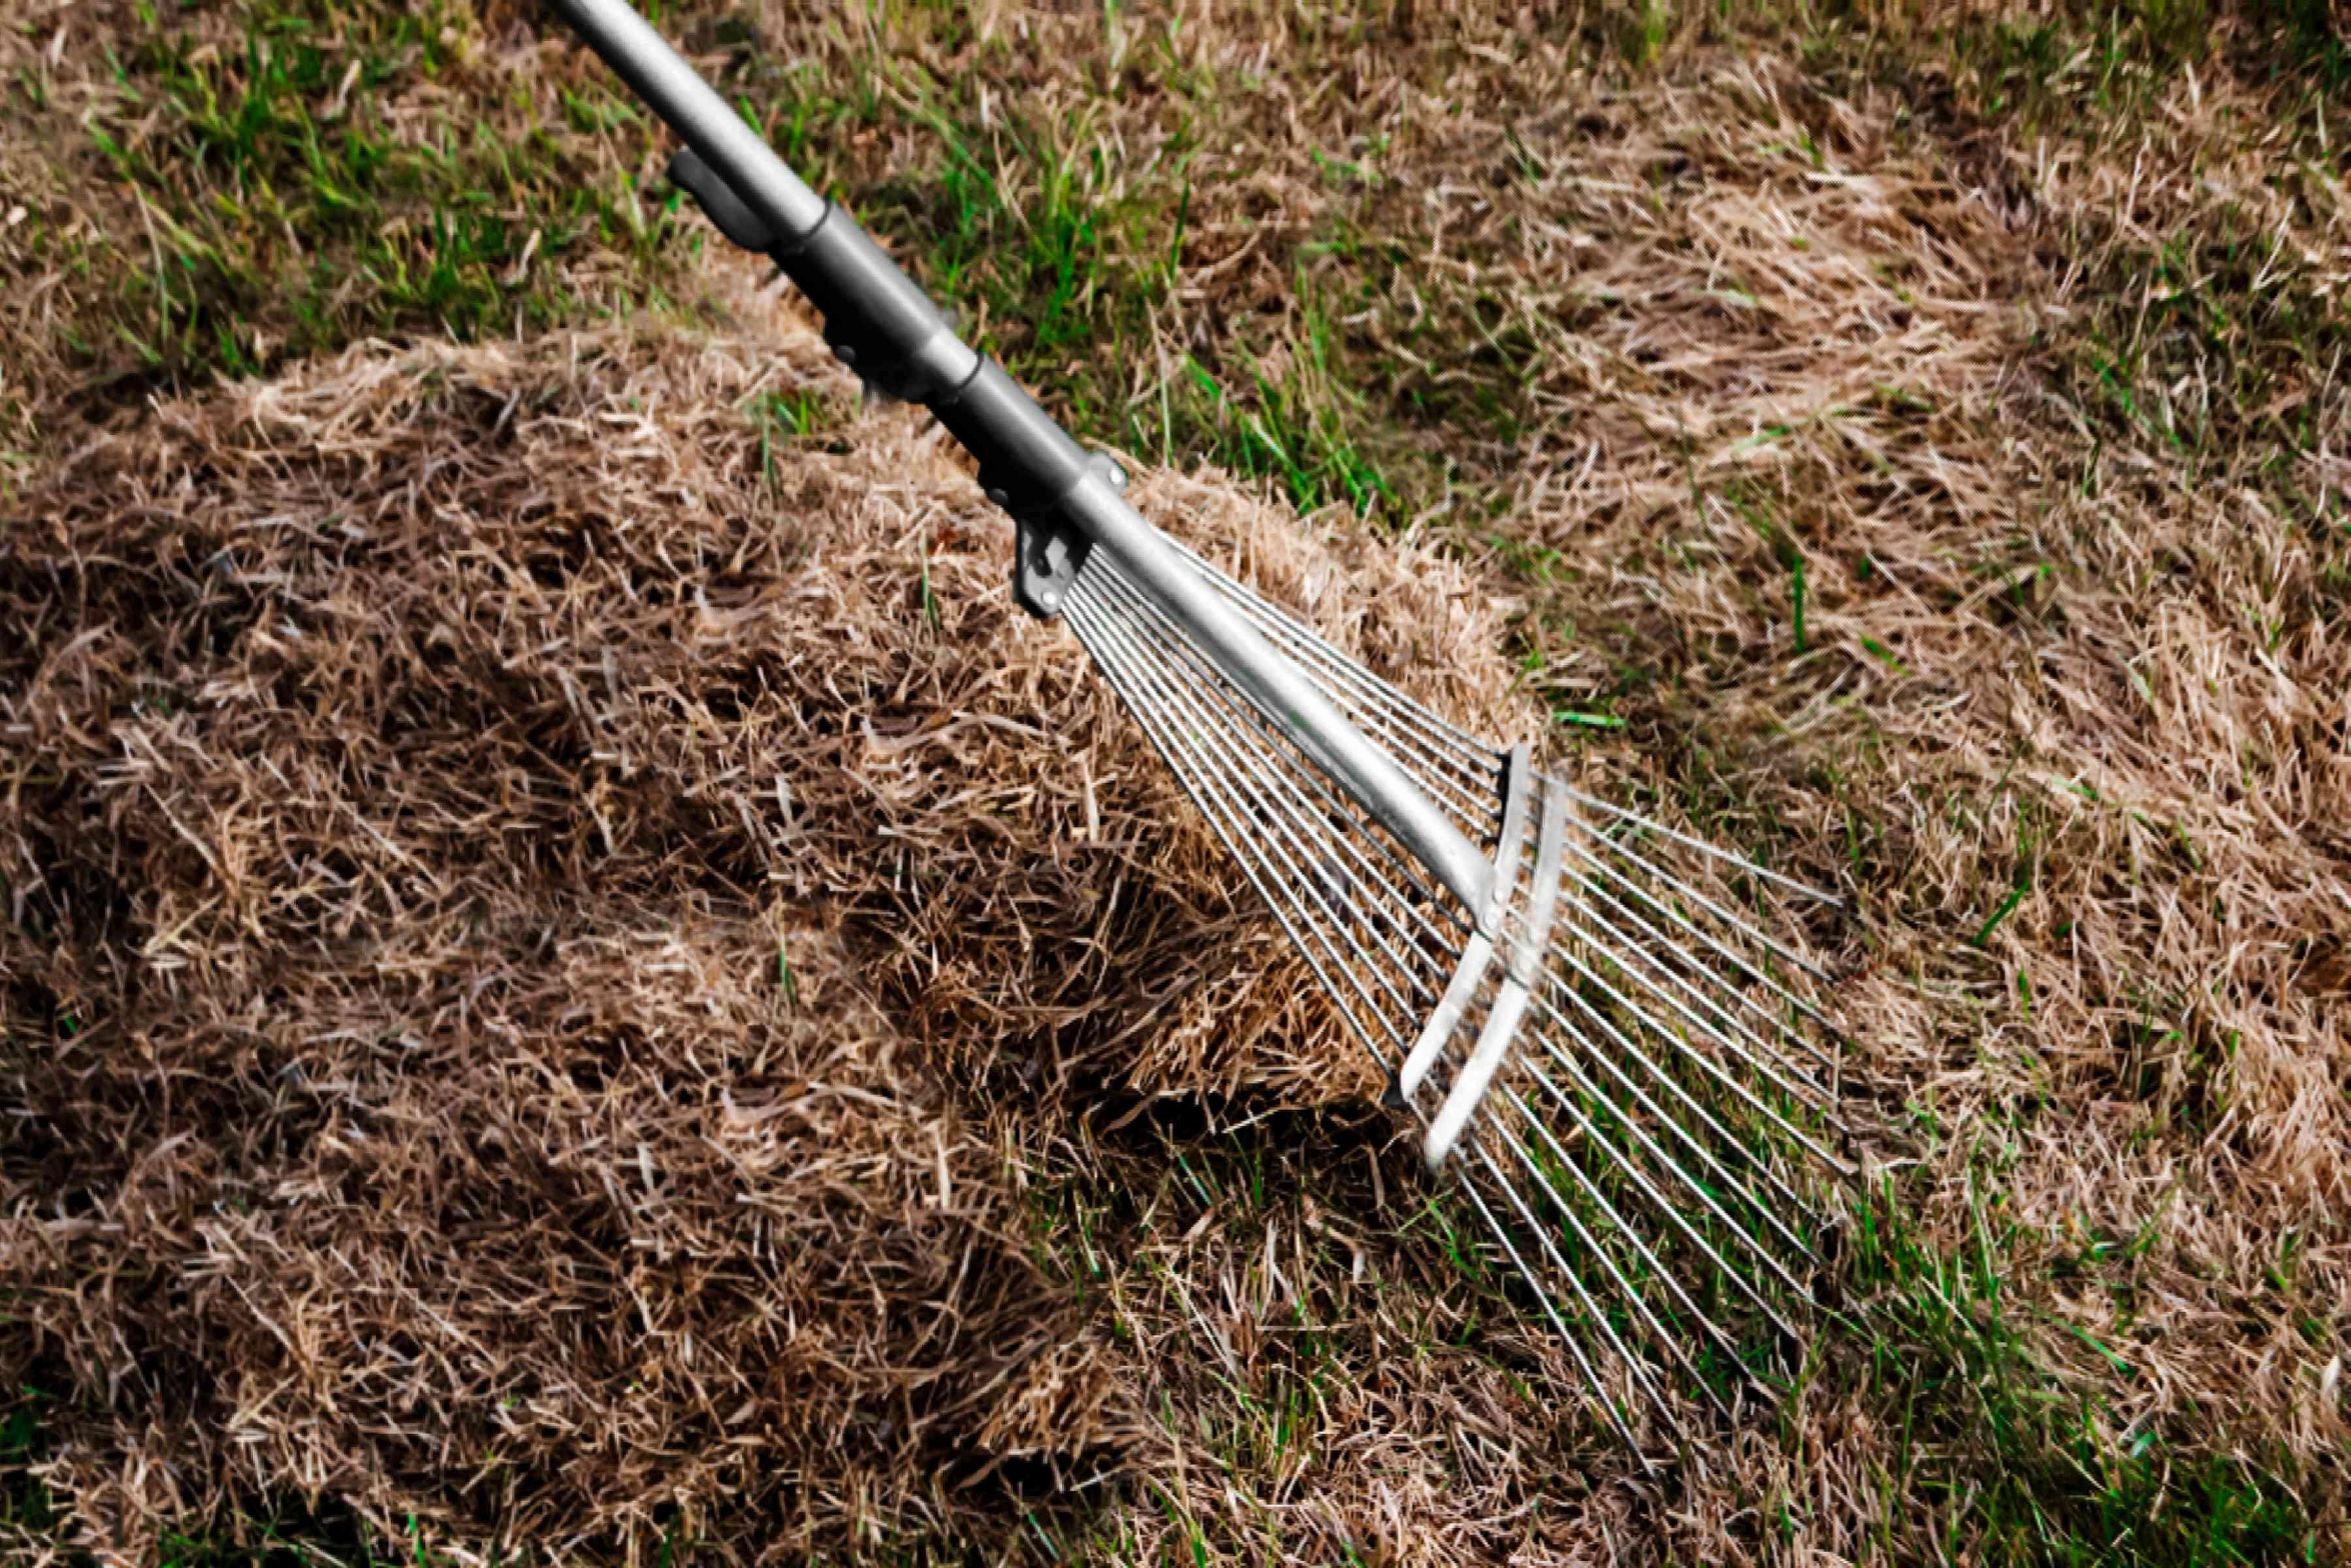 maintaining the yard